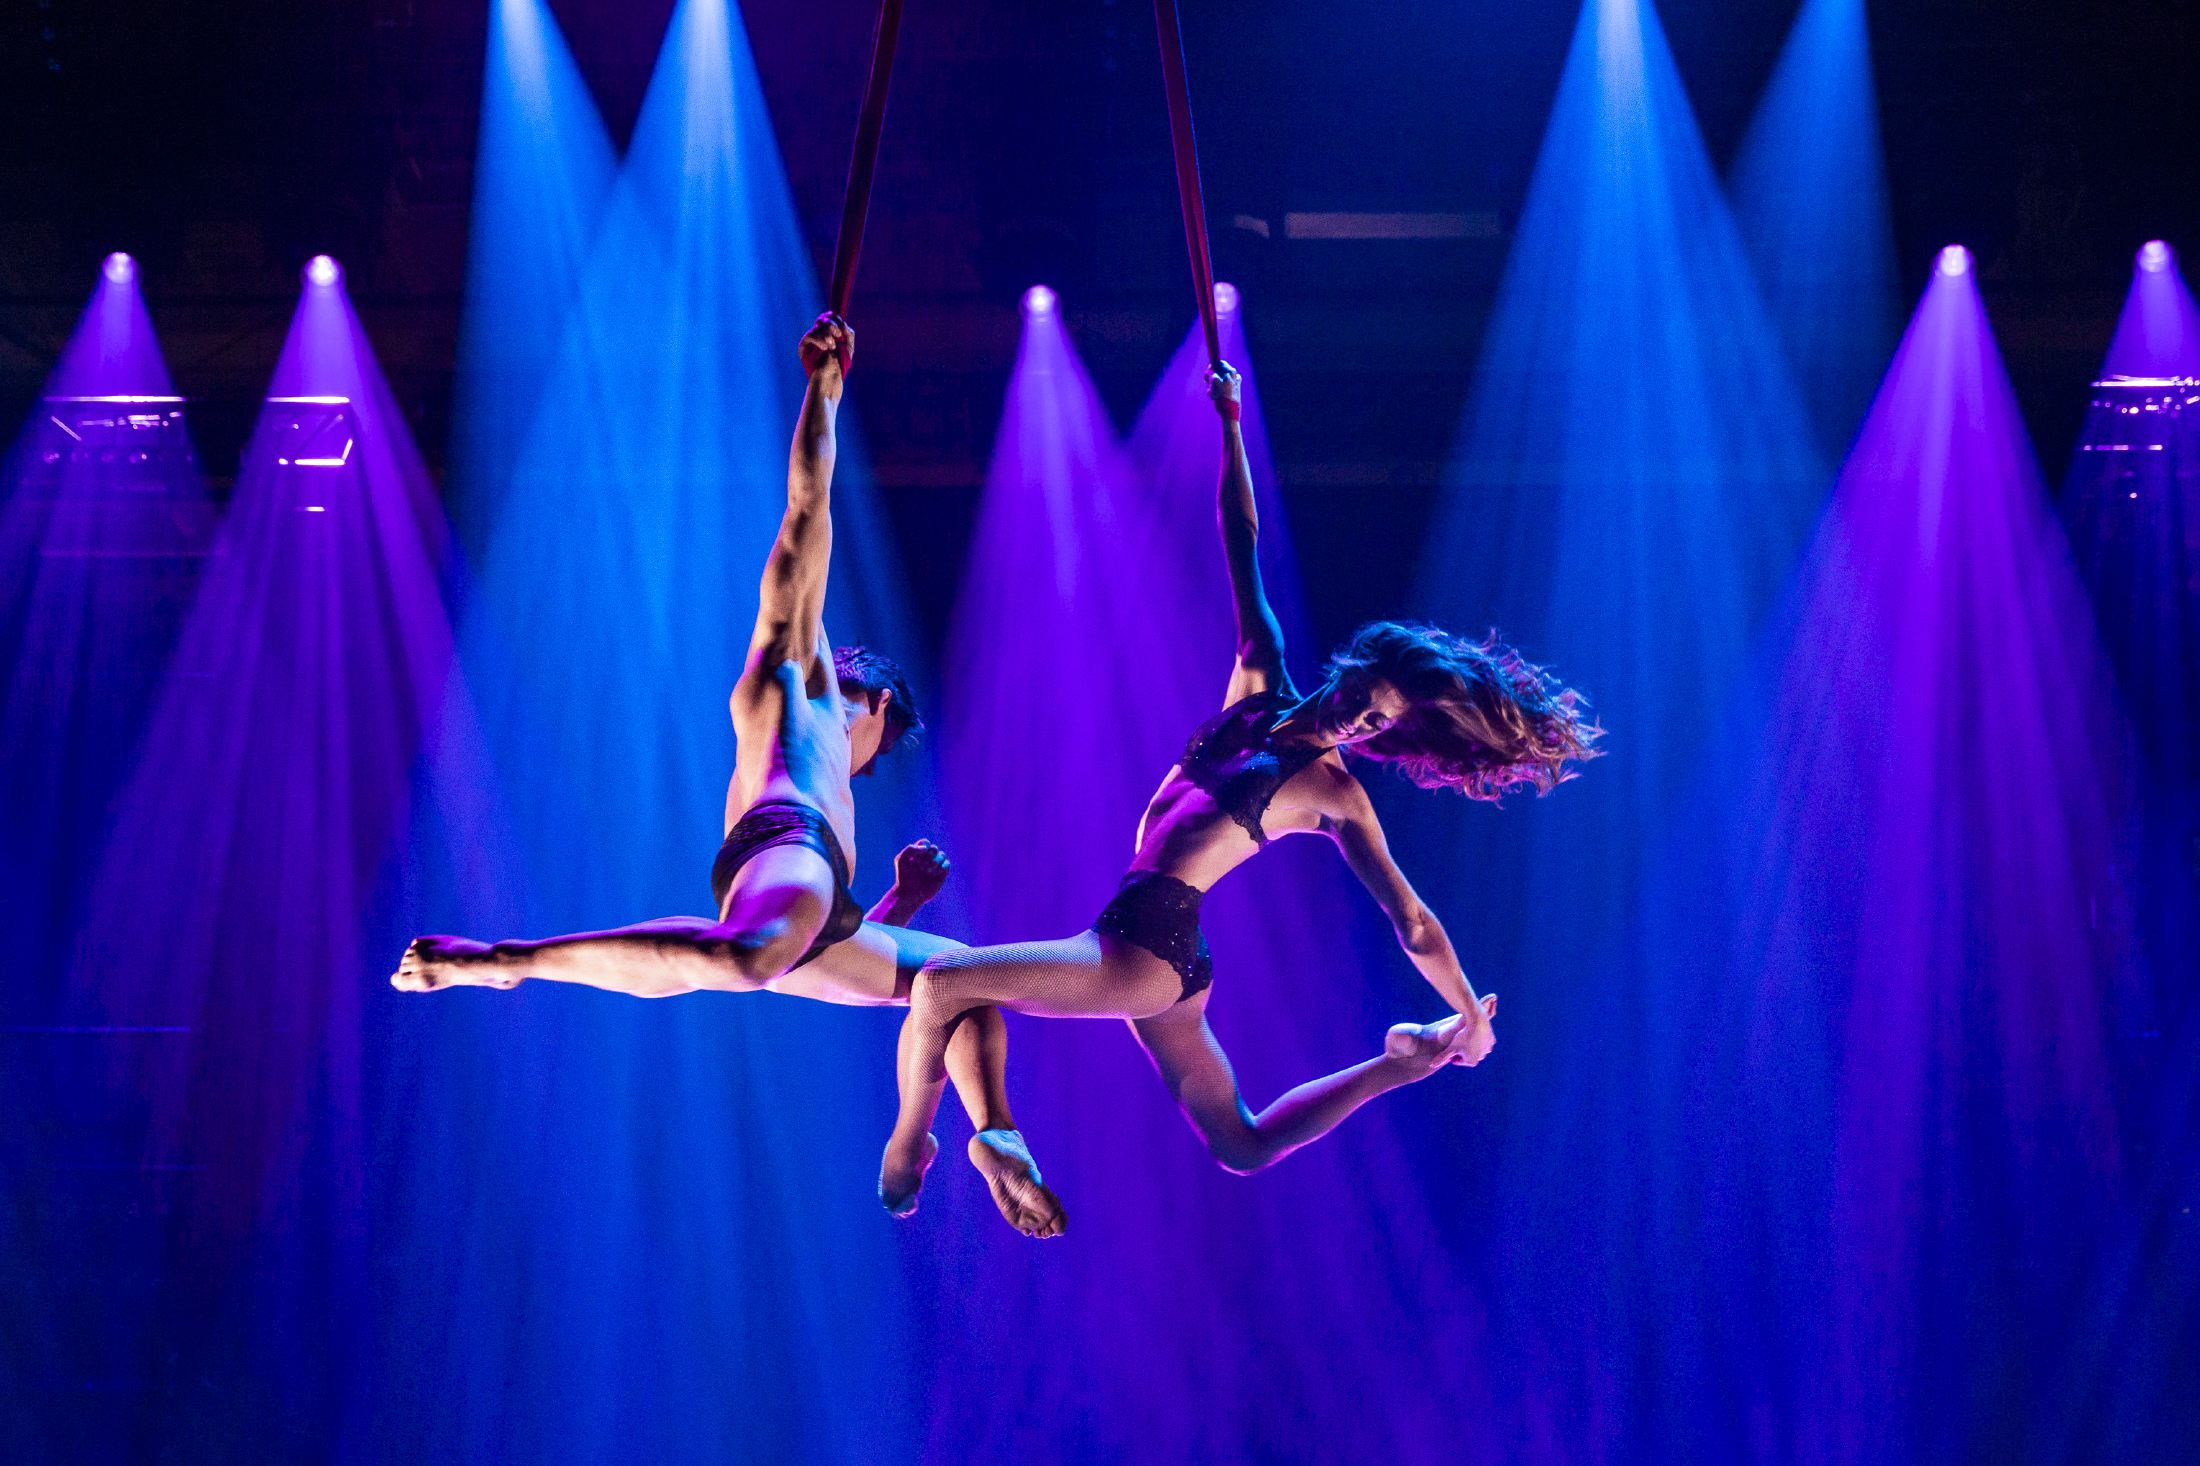 aerial straps, duo straps, akrobatik duo, luftartistik